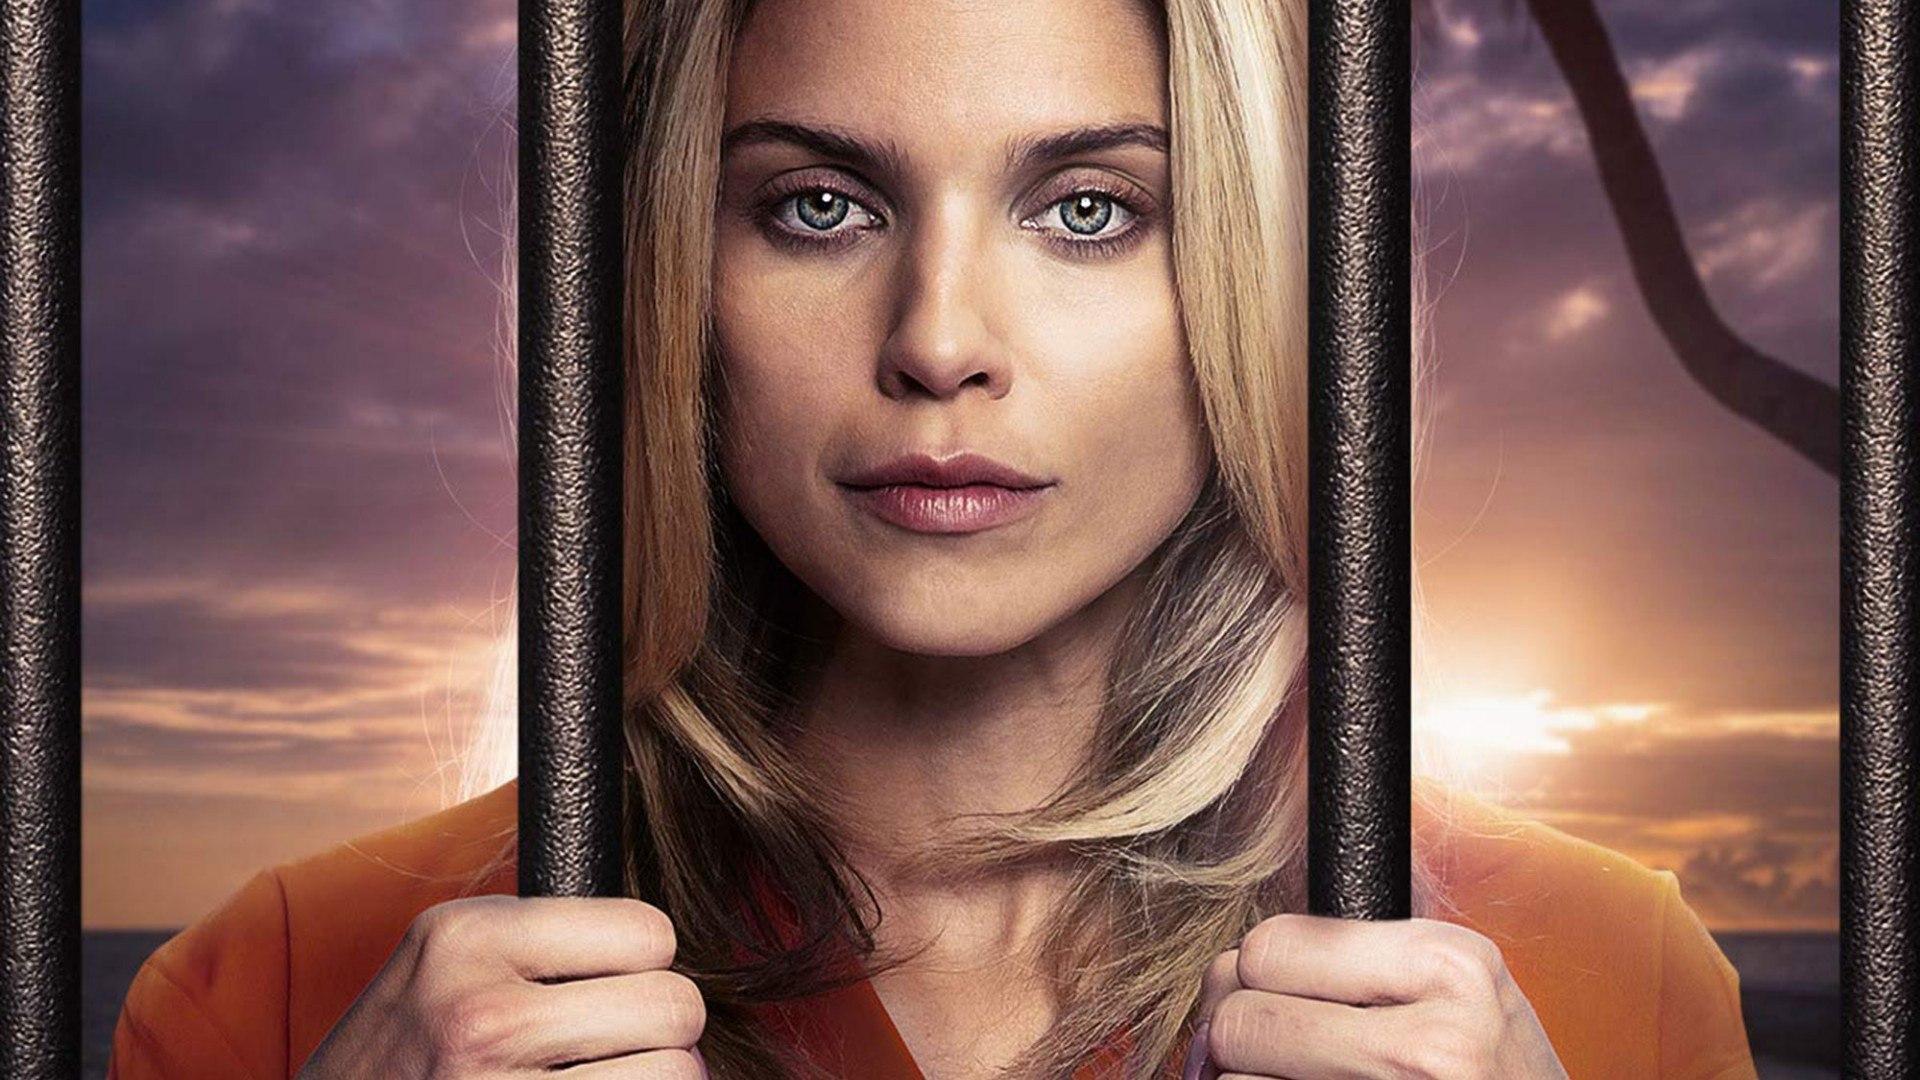 Domenica 23 Agosto 2020 Sky Cinema HD, Accuse e bugie